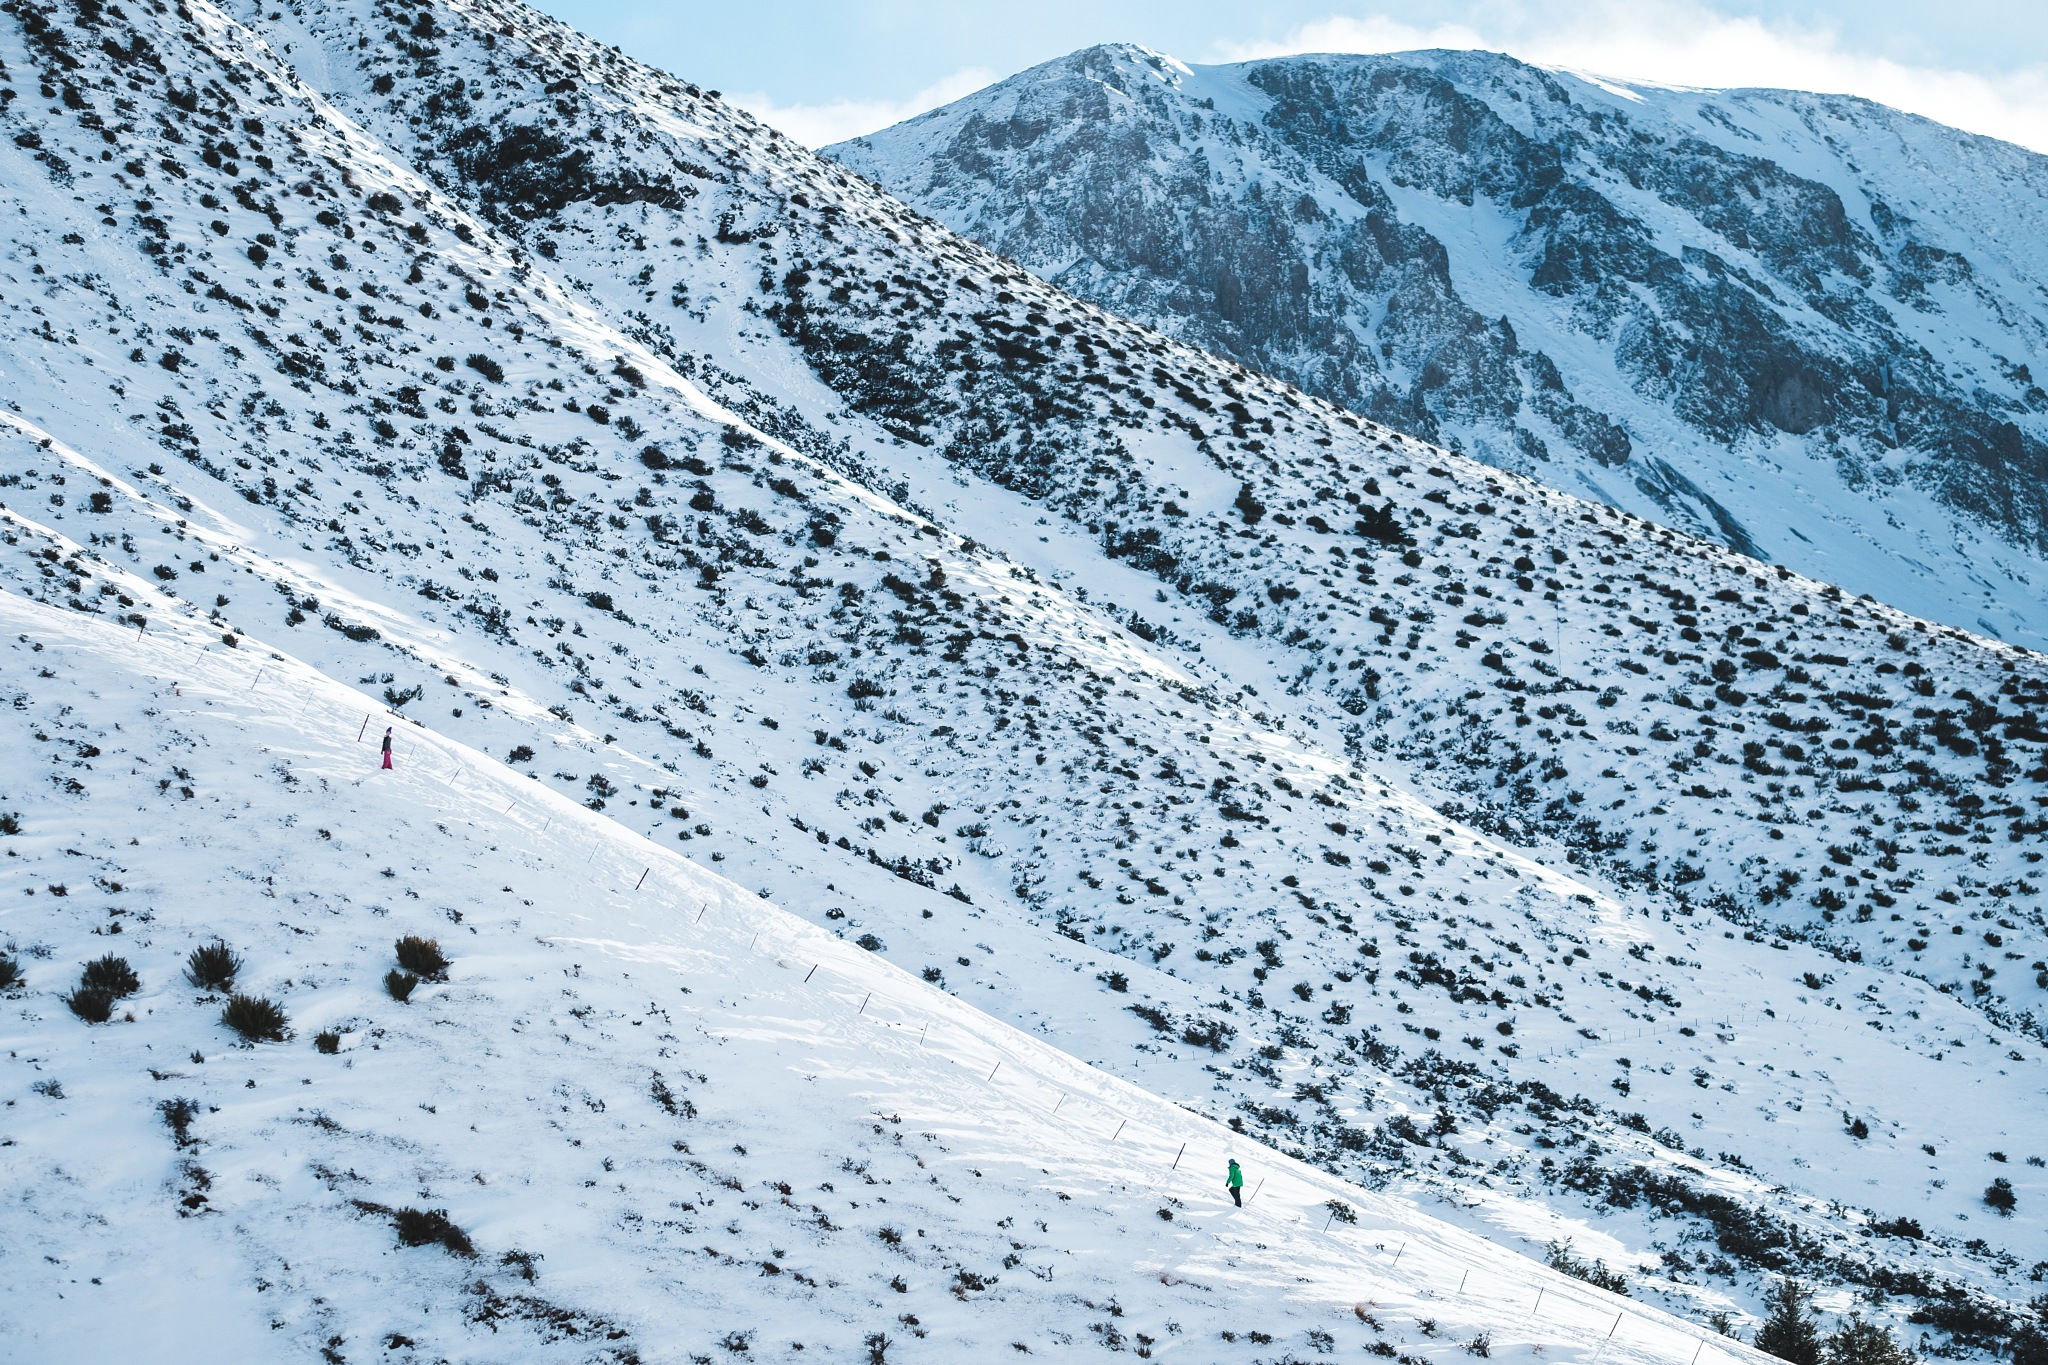 Temporary Ski Field by Luke Lee